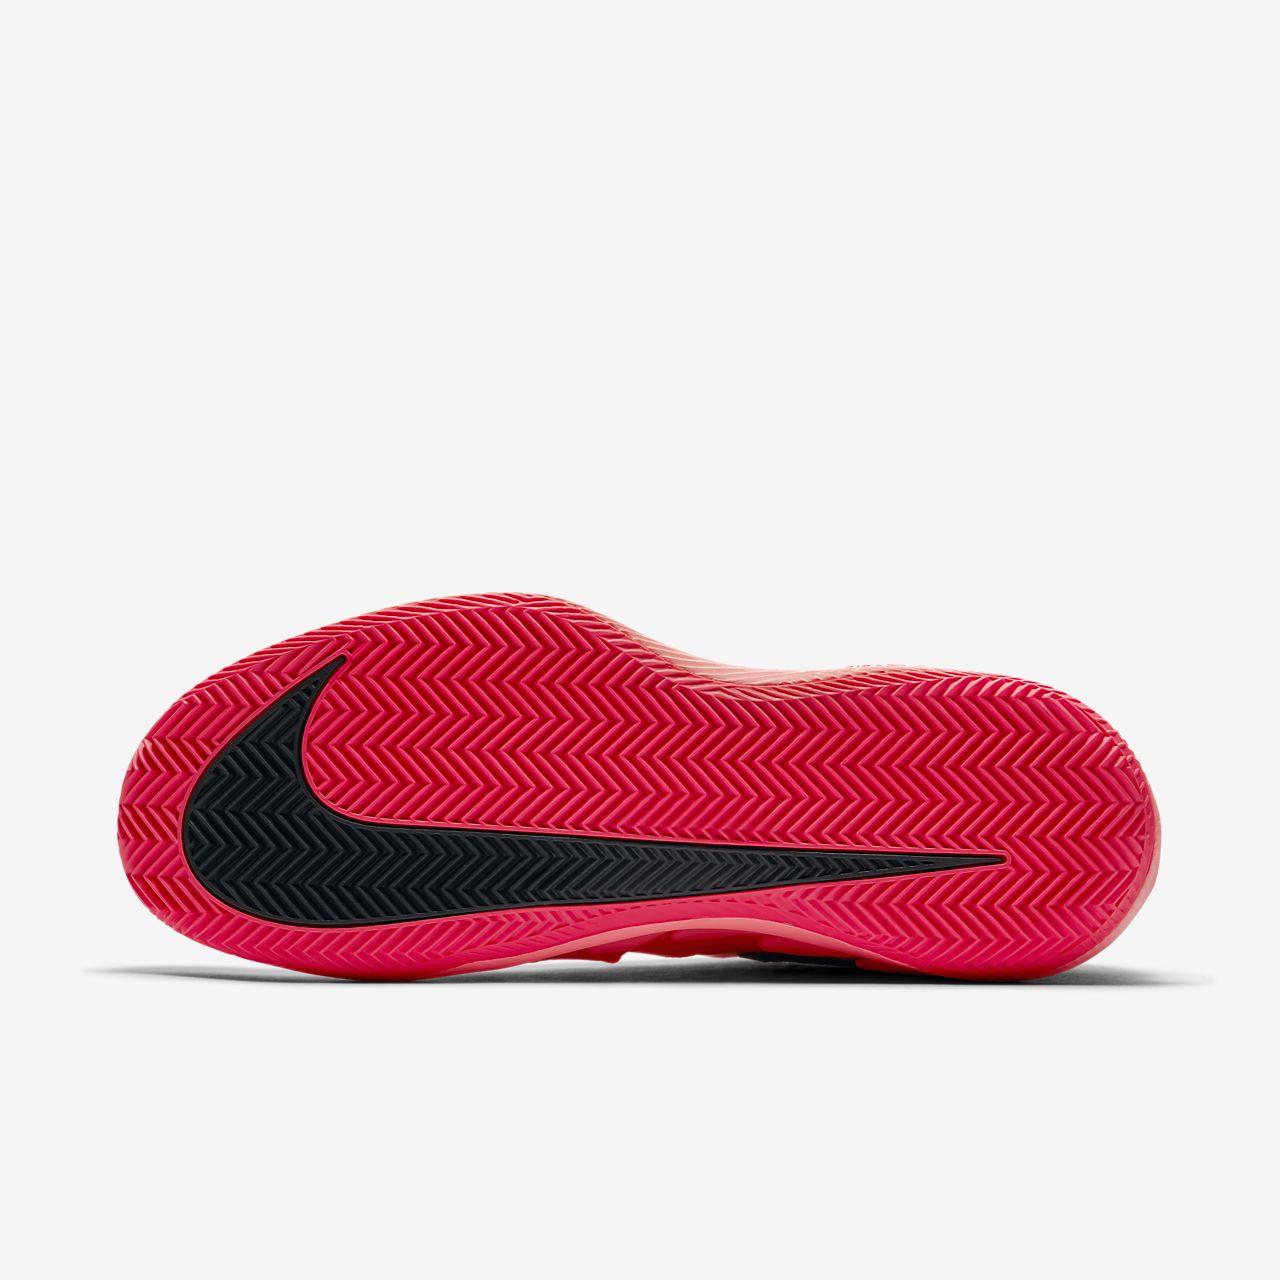 Nike.com SE Scarpa da tennis Nike Air Zoom Vapor X Clay - Uomo. 54a2b4c2b111